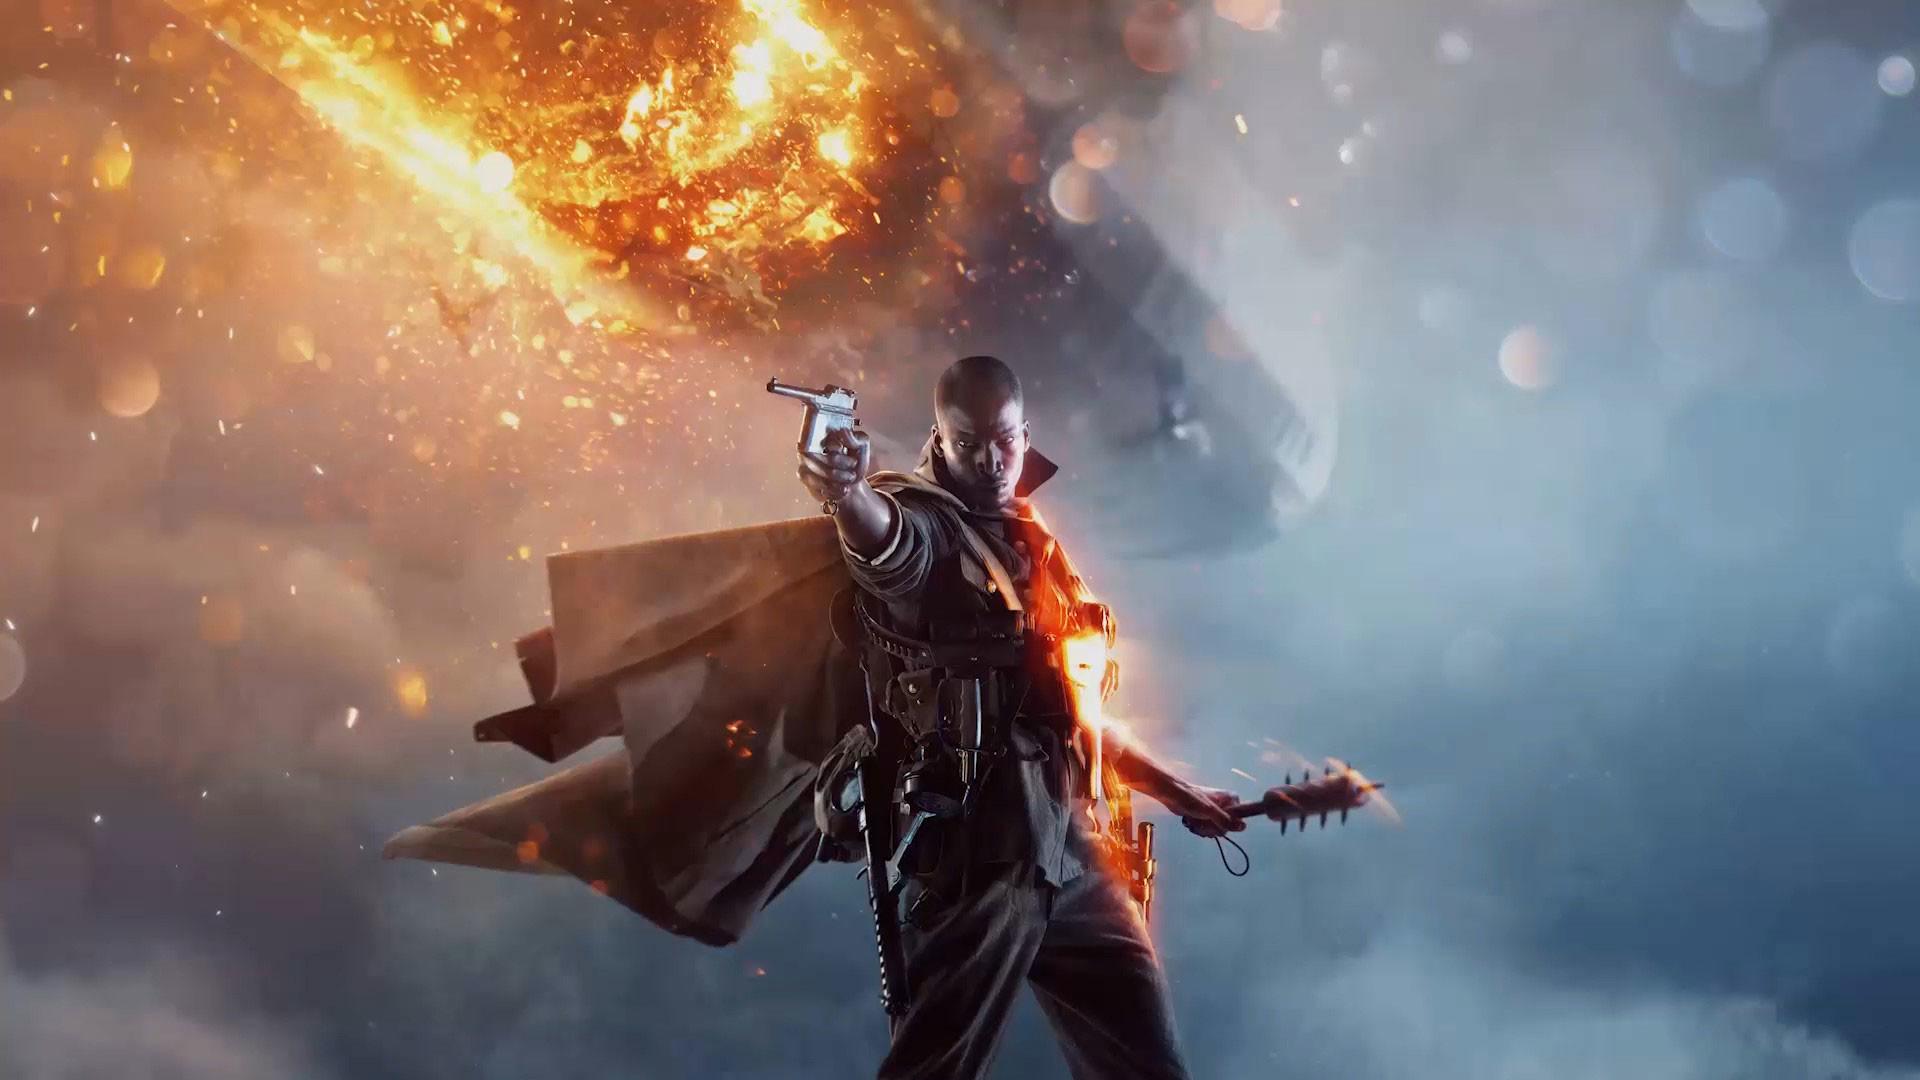 Battlefield 1 4K Wallpaper   Battlefield 1 1080p Wallpaper …